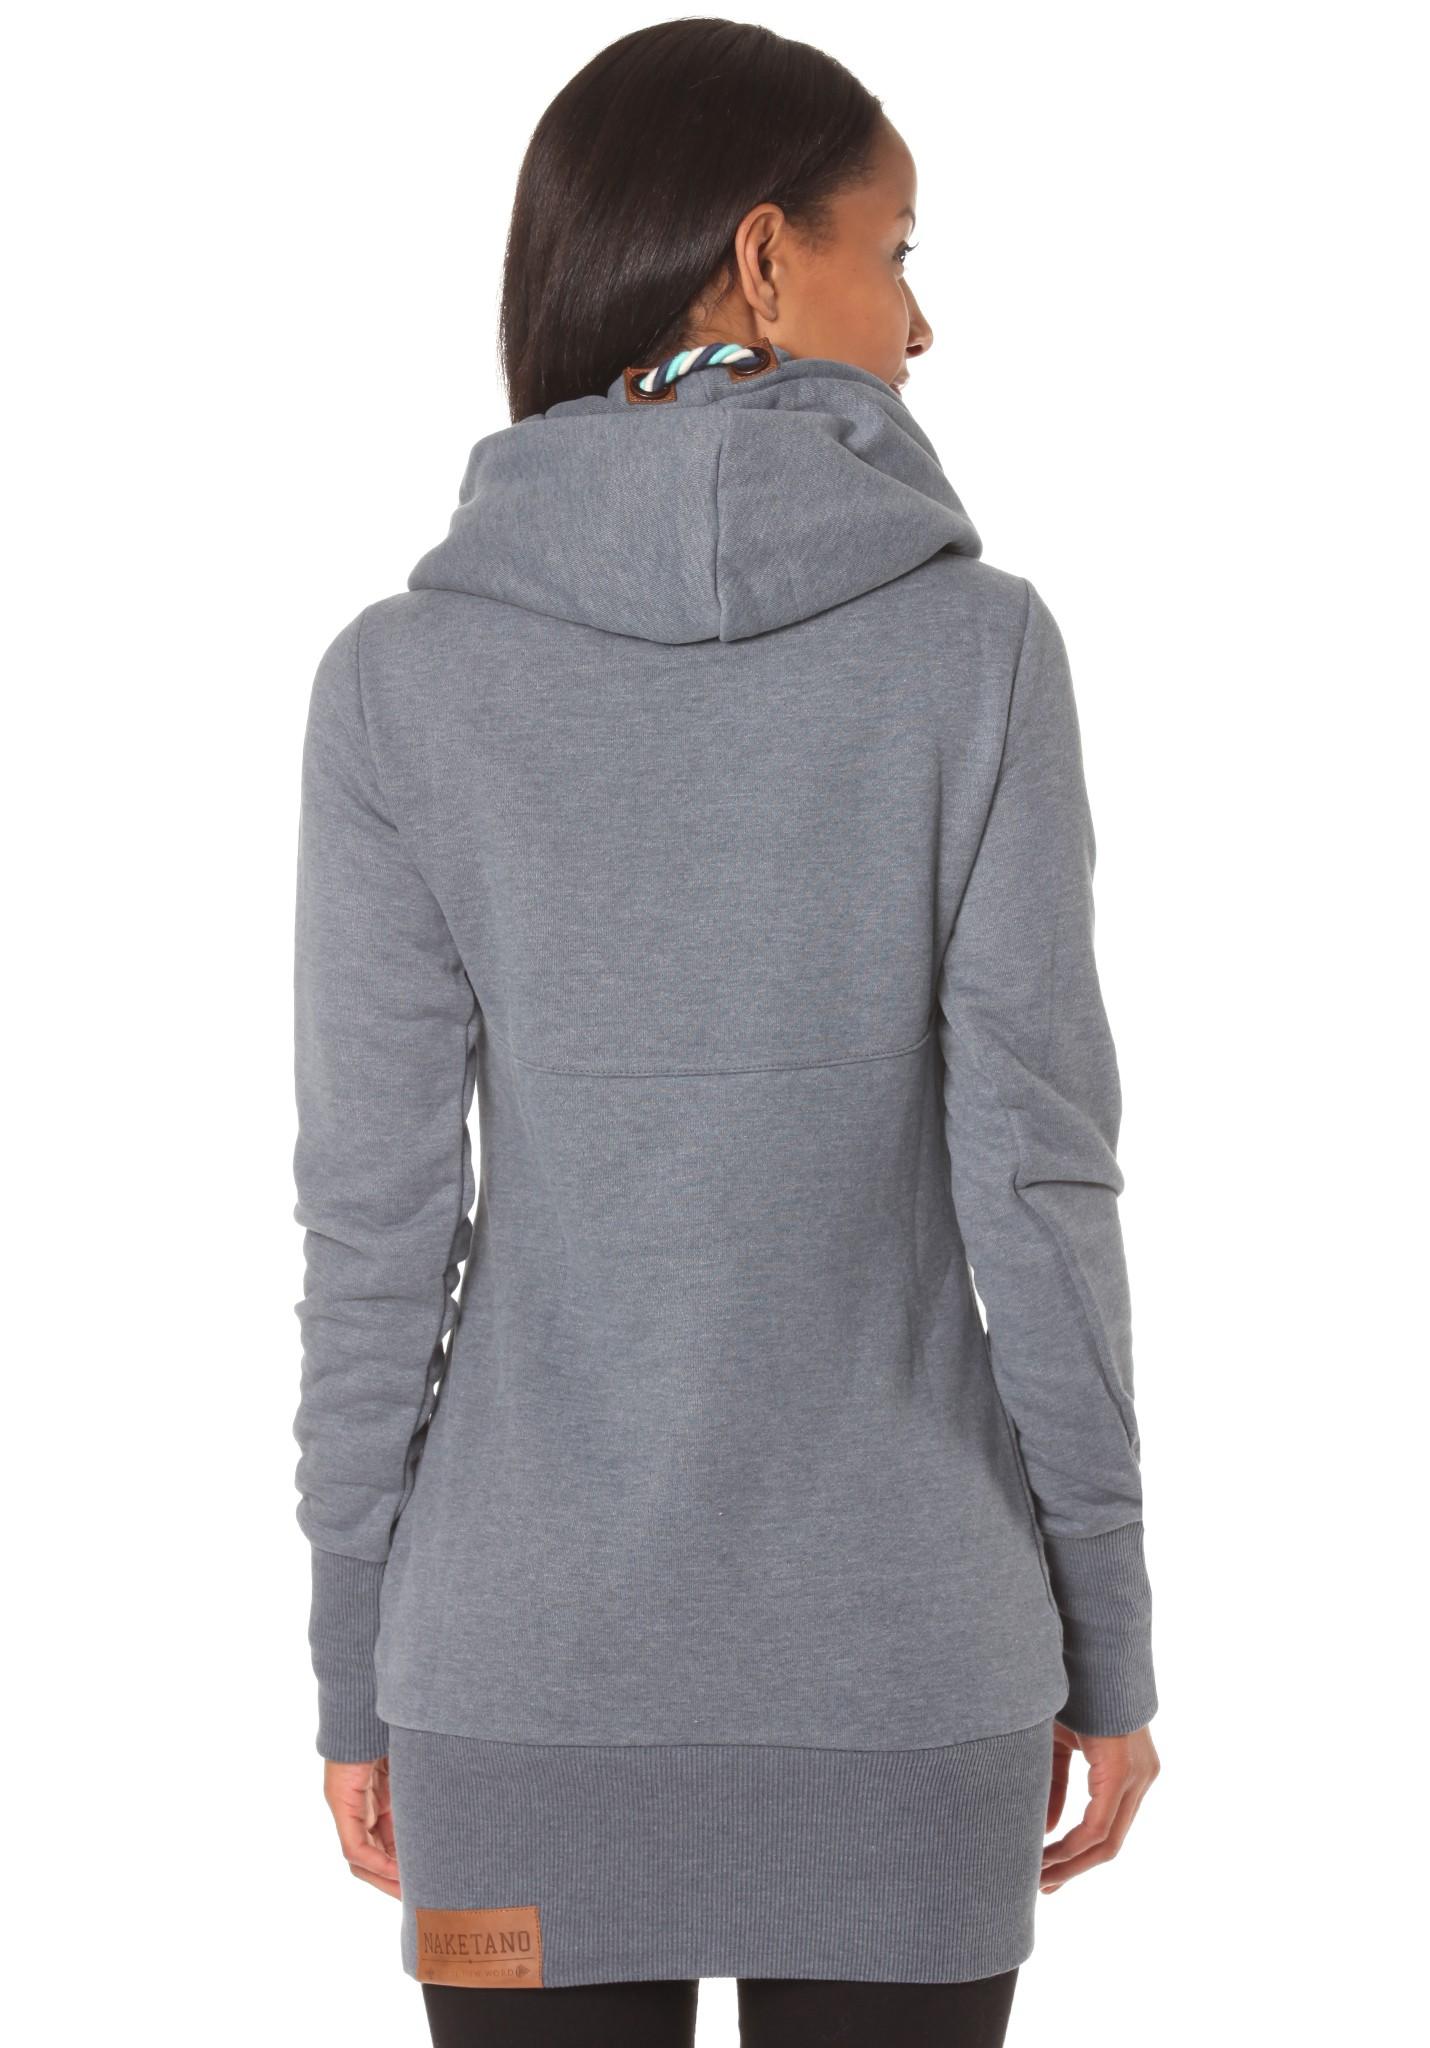 neu naketano lange vii damen kapuzenpullover pullover hoodie kapuzenjacke ebay. Black Bedroom Furniture Sets. Home Design Ideas